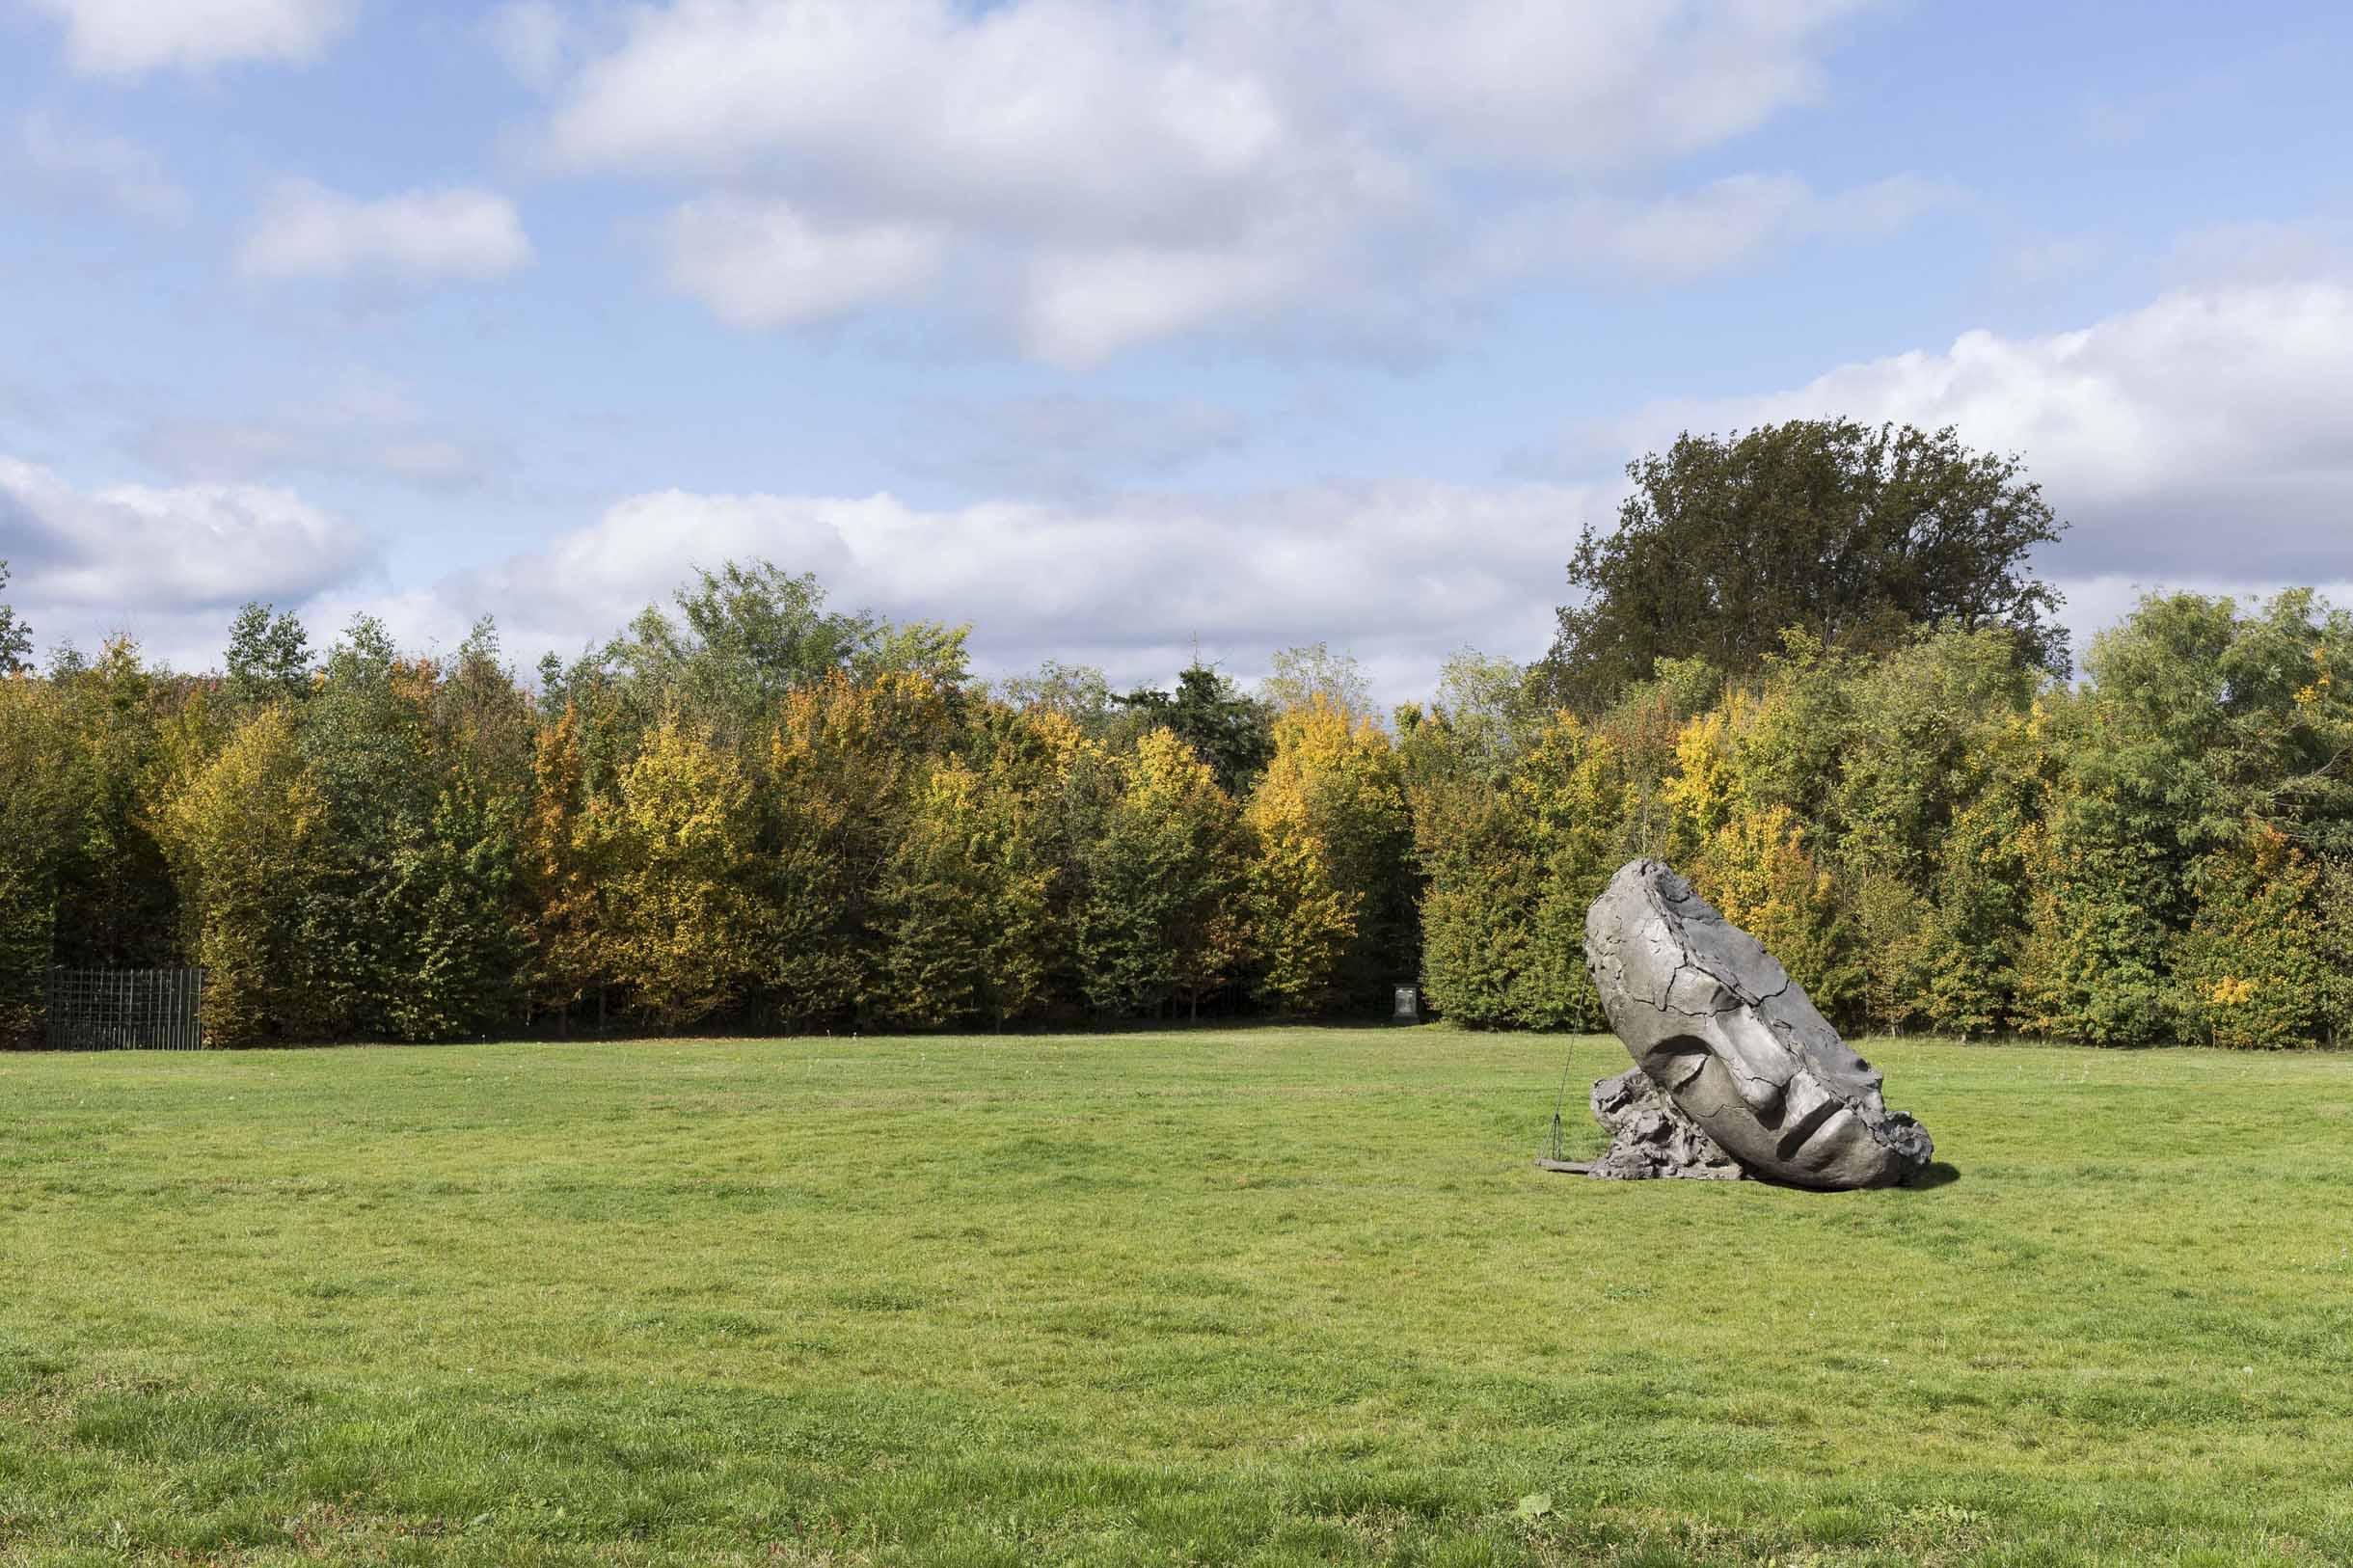 Mark Manders, Dry Clay Head, 2015-2017 Bronze patiné Courtesy de l'artiste, Zeno X Gallery (Anvers), Tanya Bonakdar (New York)